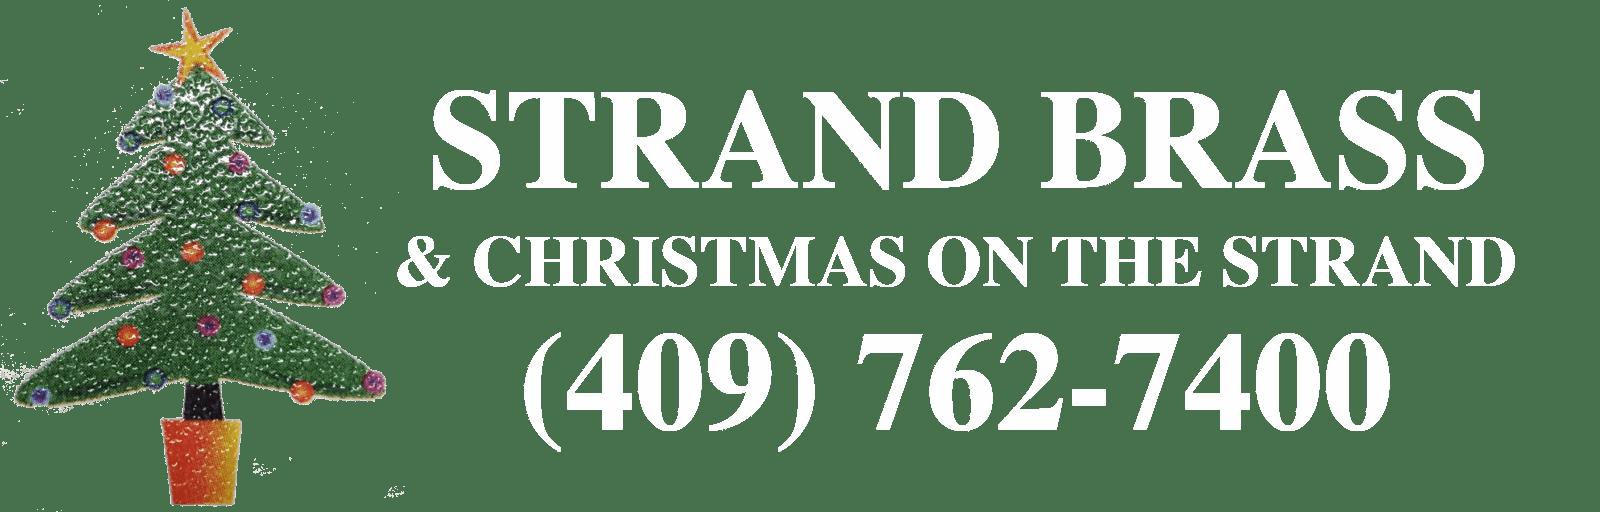 strand brass christmas store